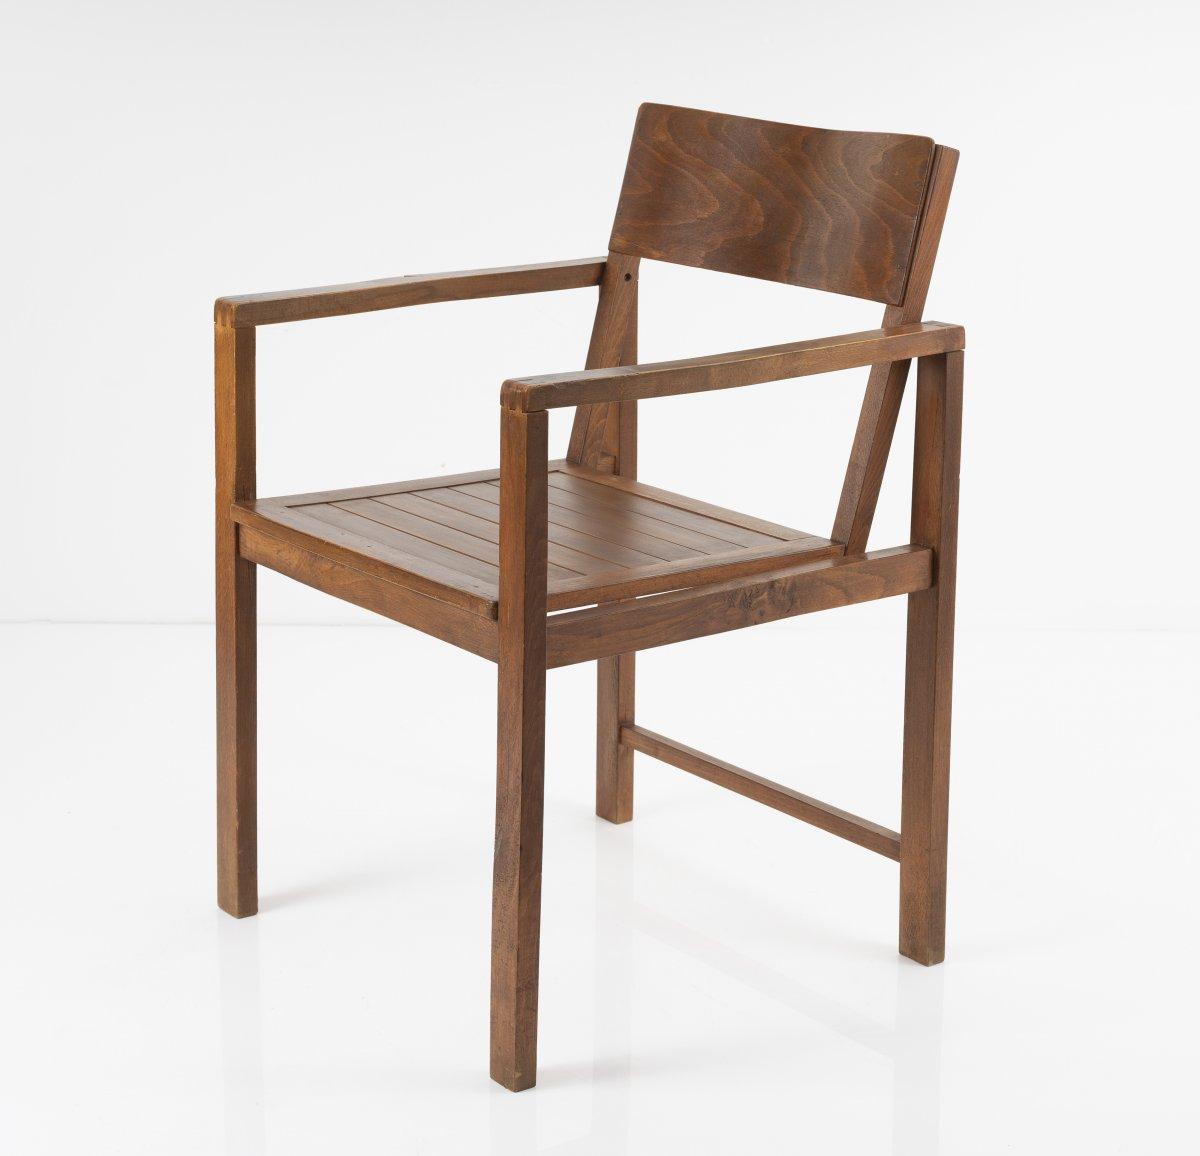 Los 54 - Erich Dieckmann, Armlehnstuhl, um 1928Armlehnstuhl, um 1928H. 80 x 53,5 x 54 cm.Hausrat GmbH,